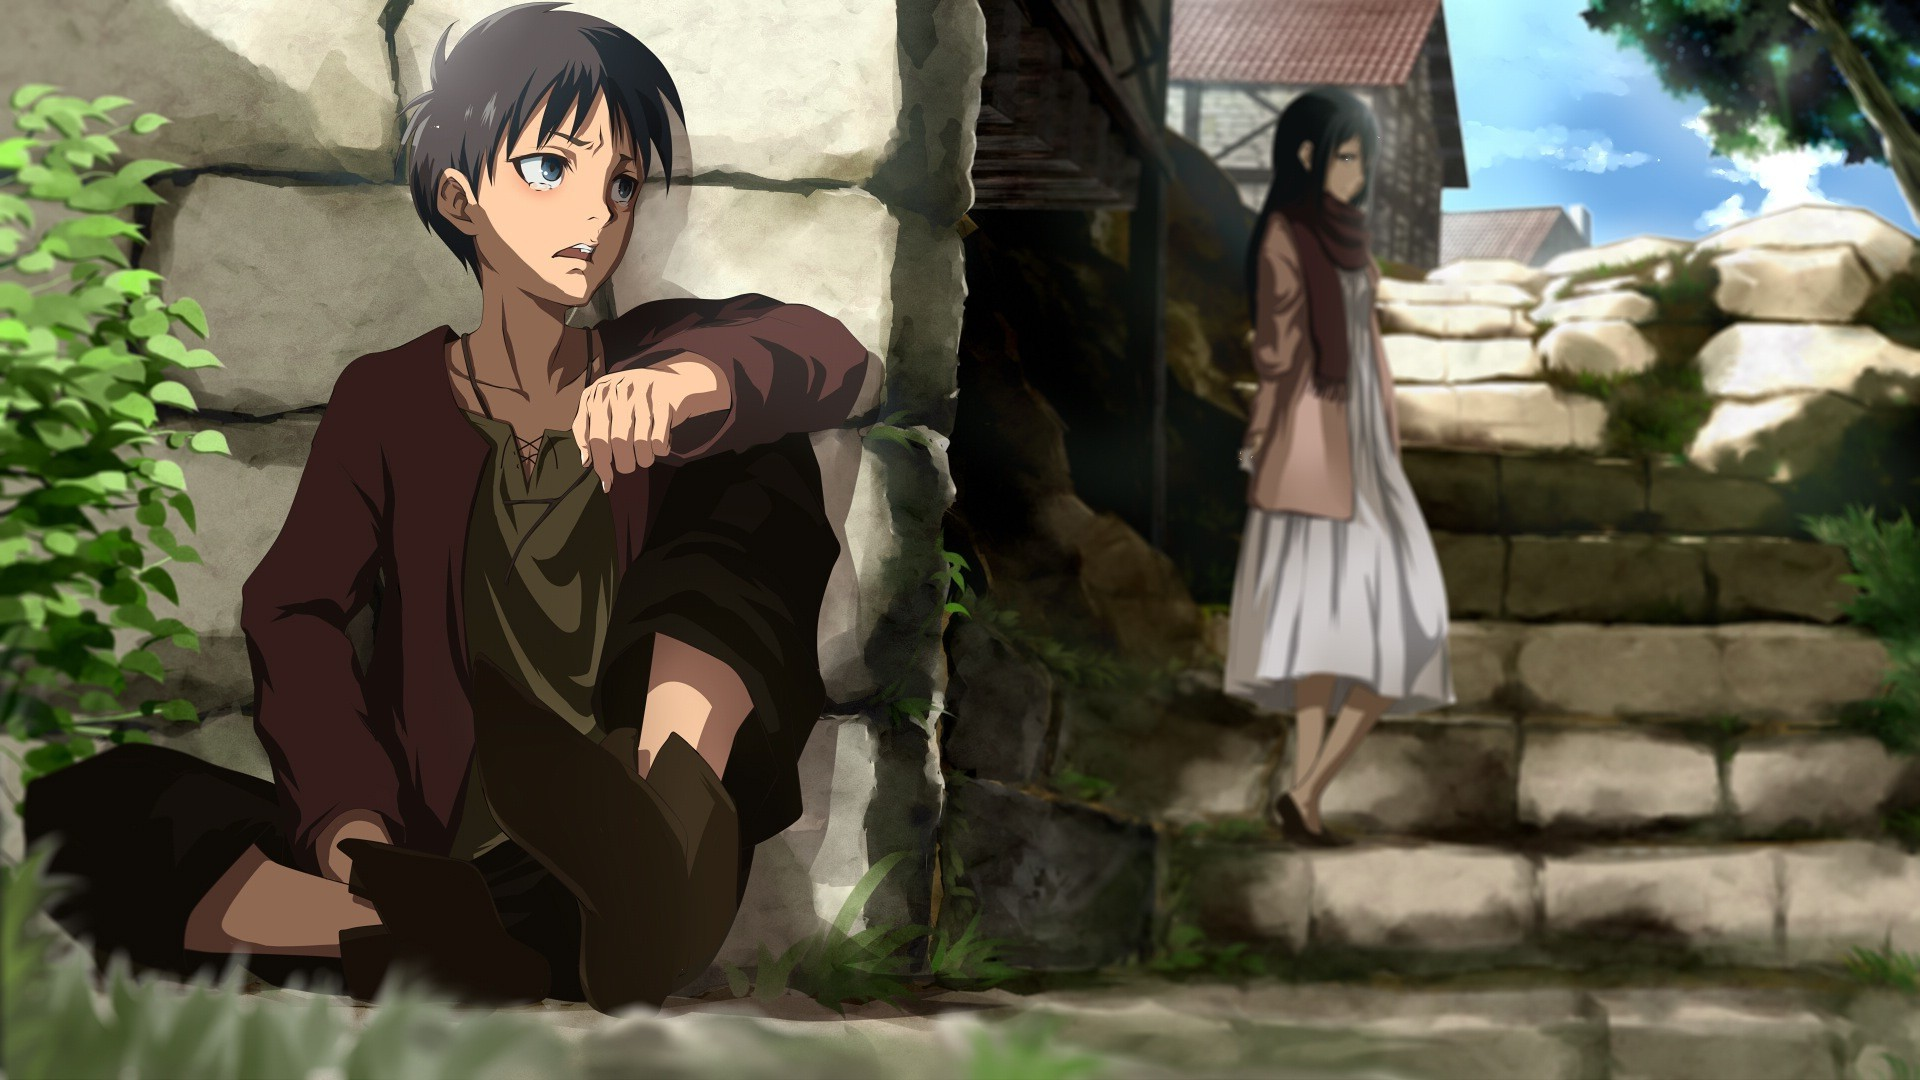 Shingeki No Kyojin Mikasa Ackerman Anime Wallpaper Attack On Titan Eren Love Mikasa 474450 Hd Wallpaper Backgrounds Download